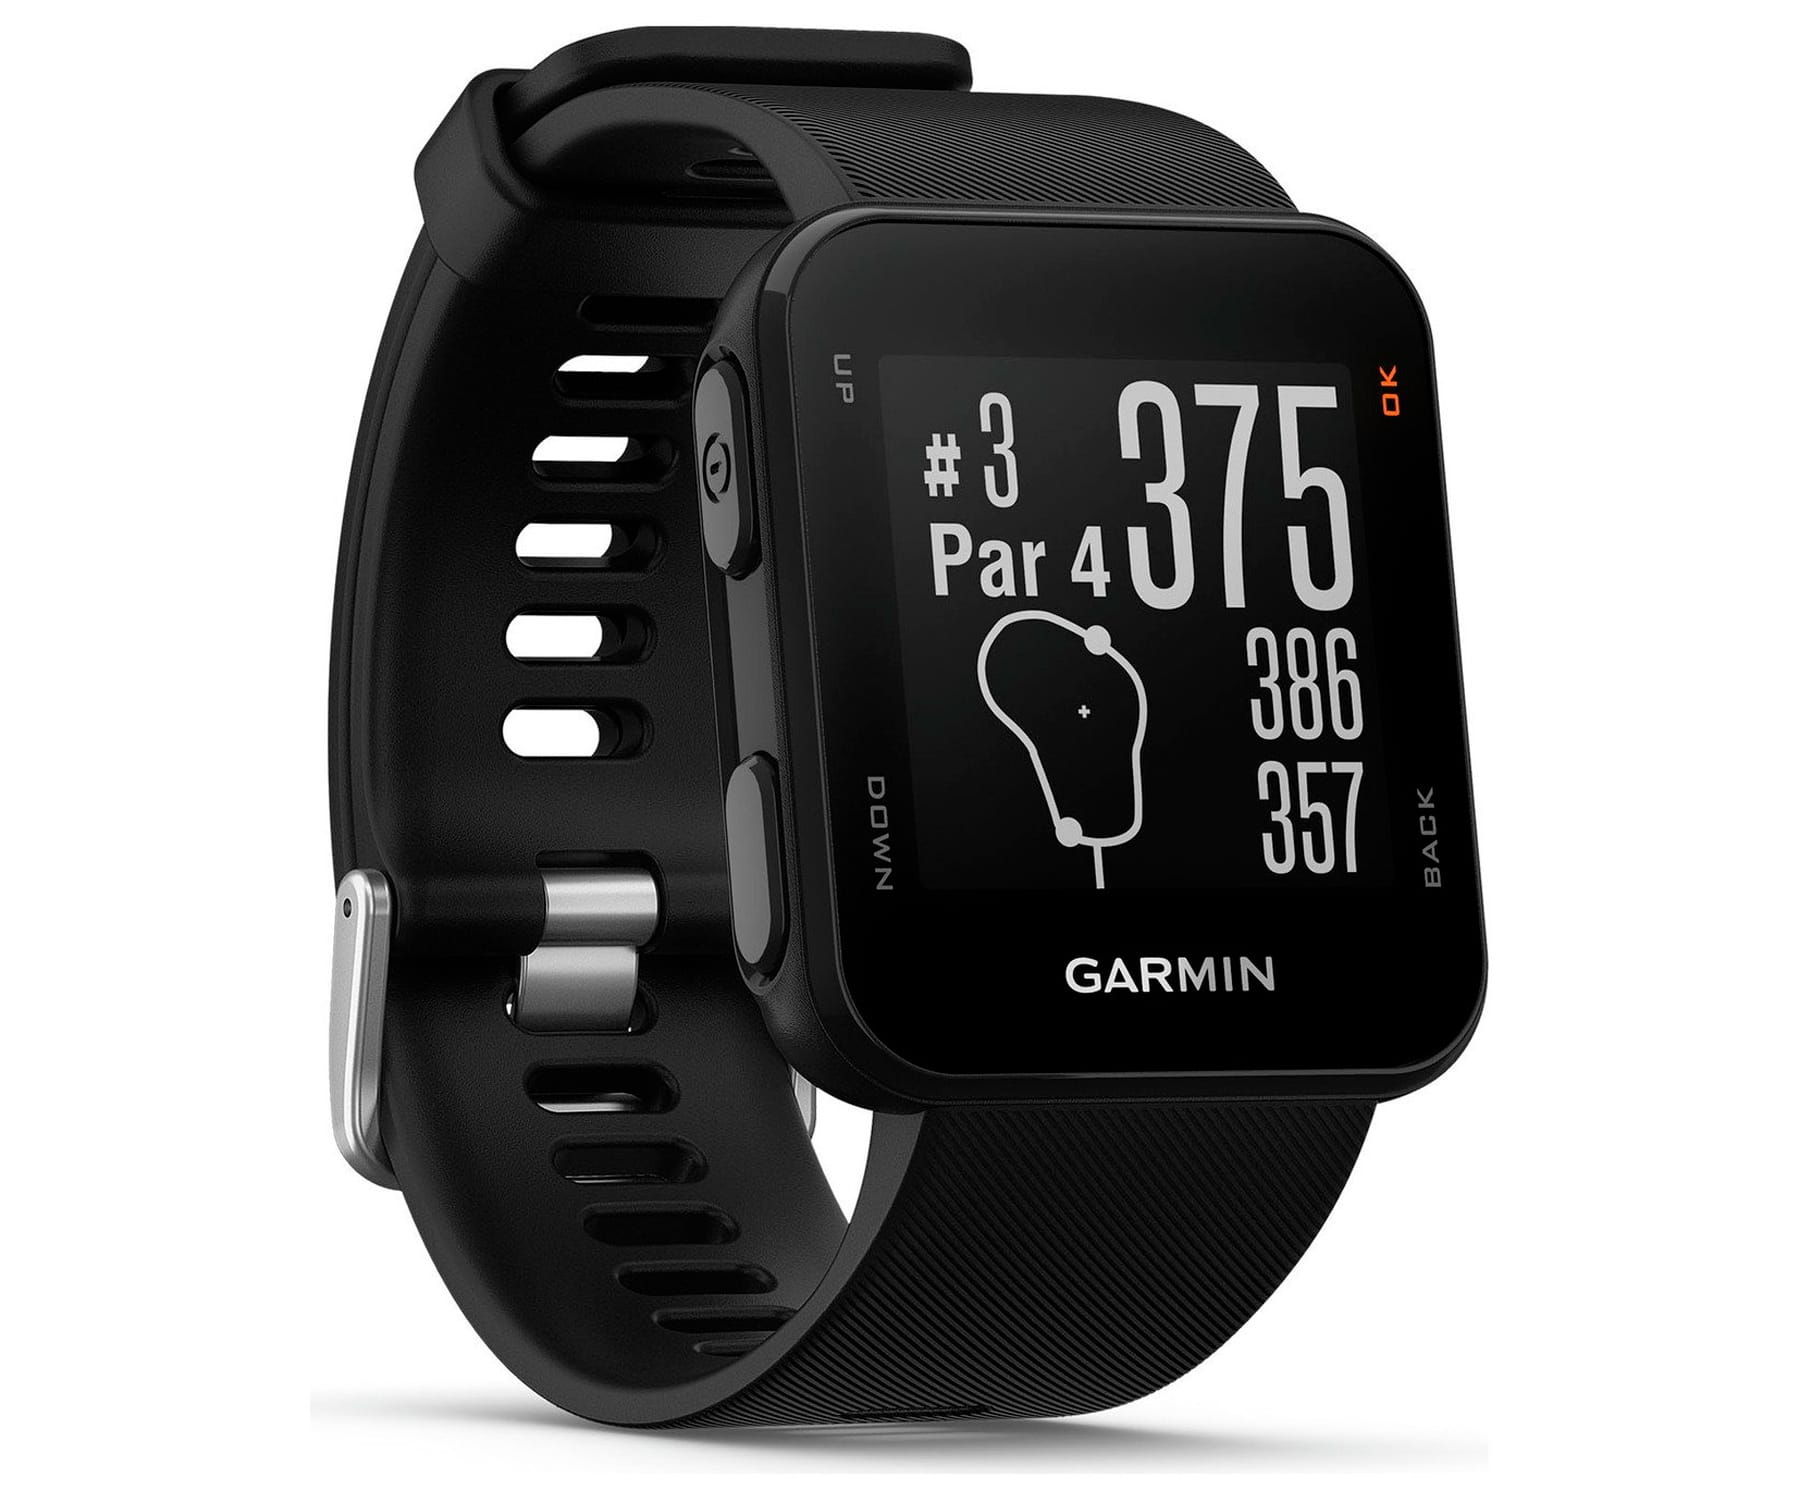 GARMIN APPROACH S10 NEGRO SMARTWATCH GOLF 1.3'' TRANSFLECTIVA GPS